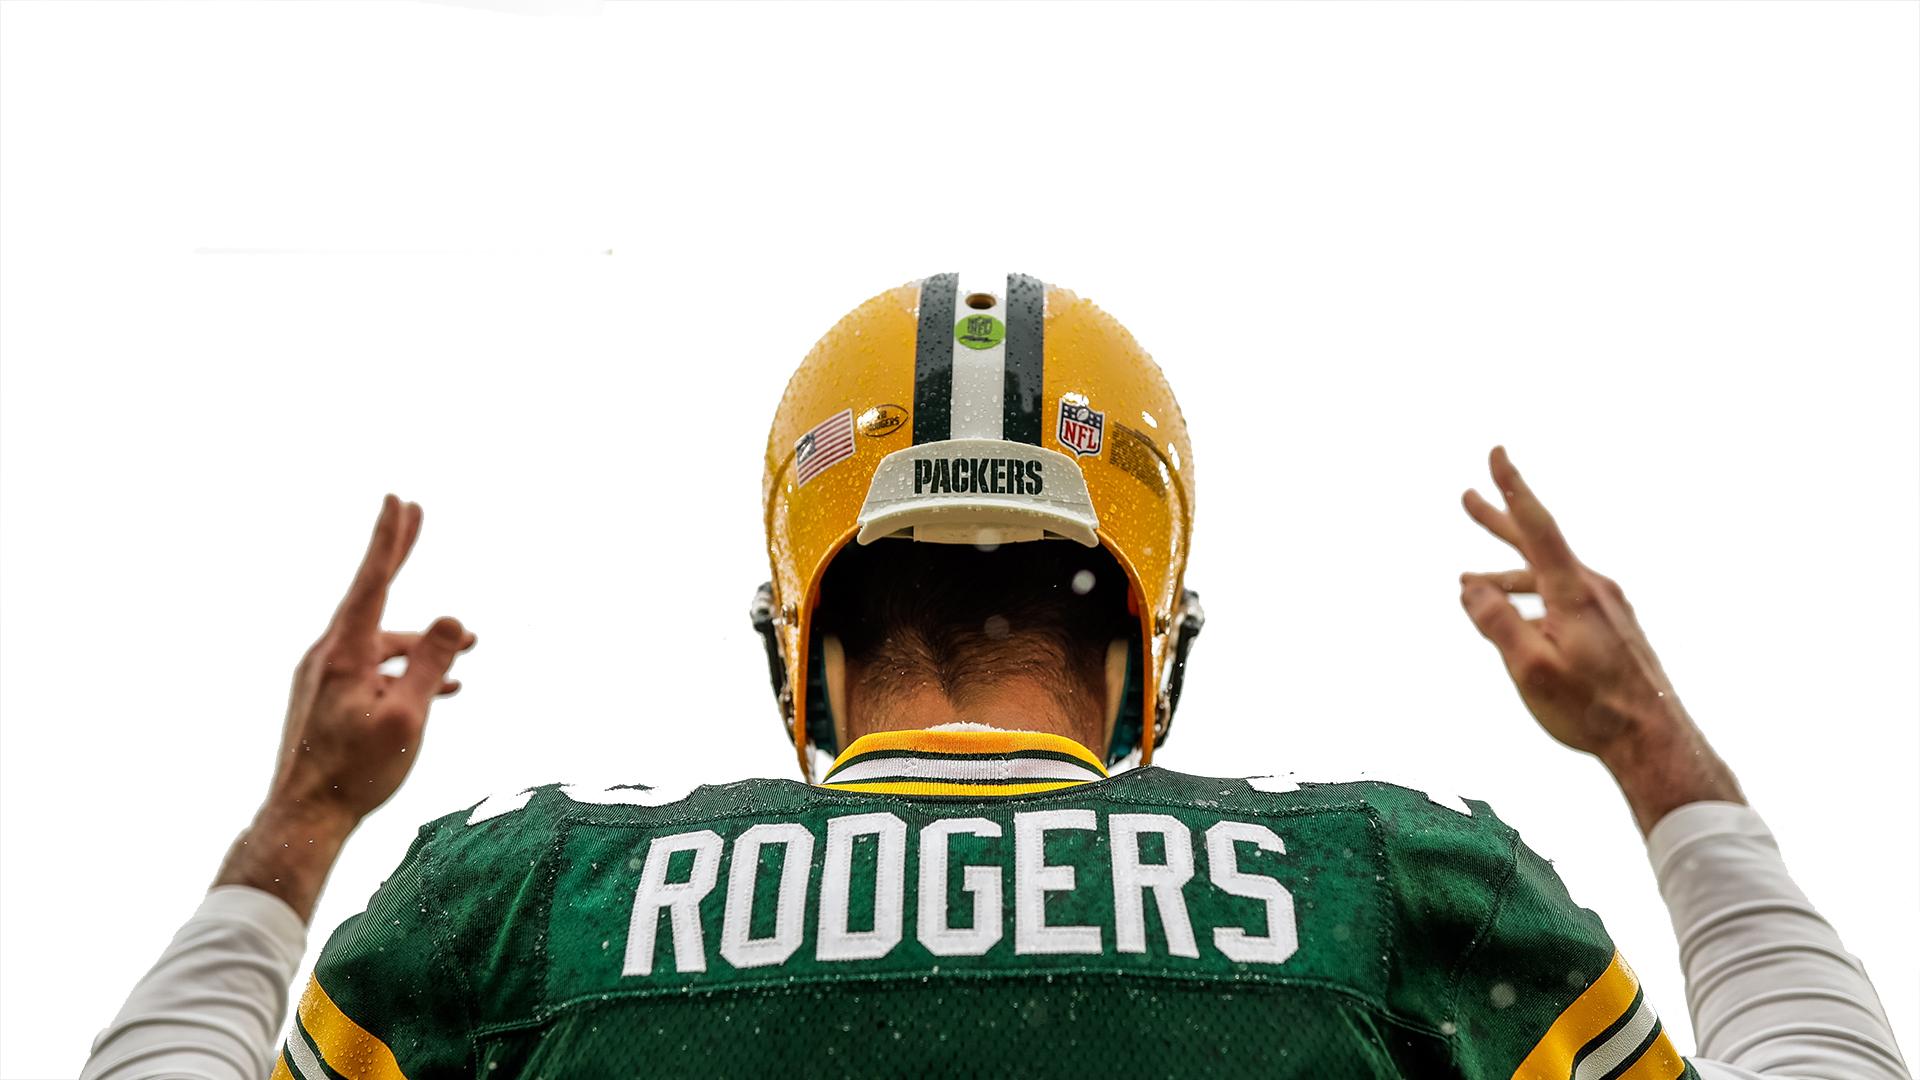 Packers Desktop Wallpapers Green Bay Packers Packers Com